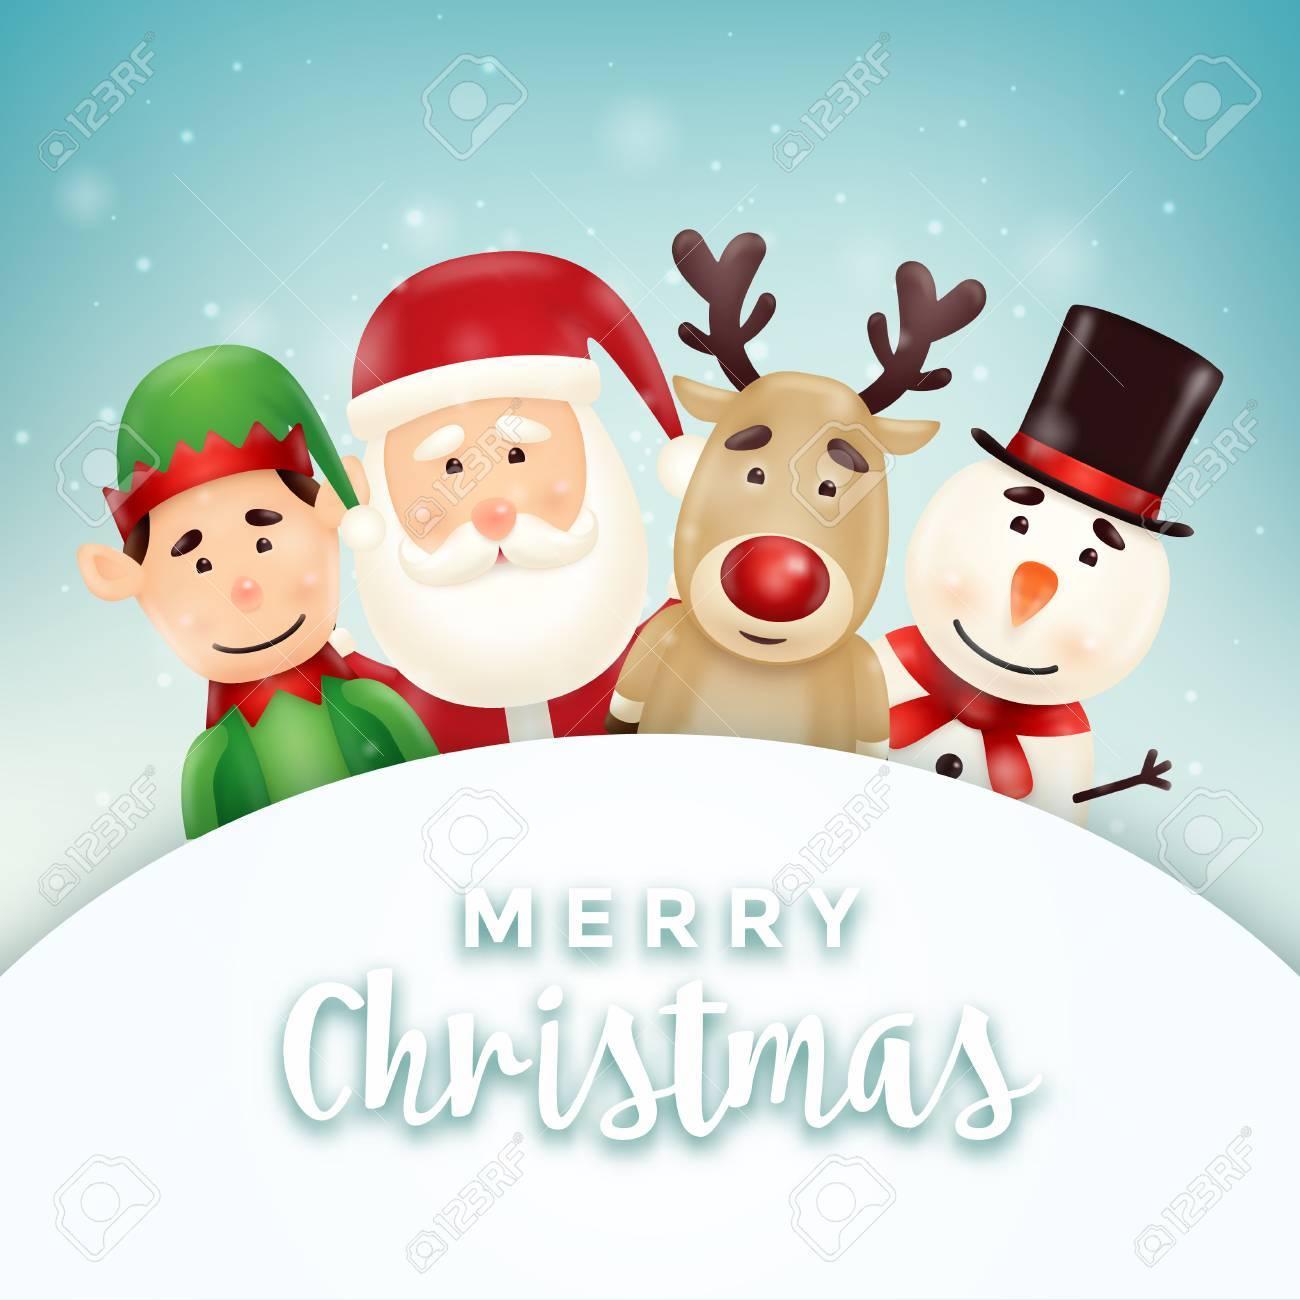 Christmas greeting card with cute santa snowman elf and reindeer christmas greeting card with cute santa snowman elf and reindeer characters stock vector kristyandbryce Gallery